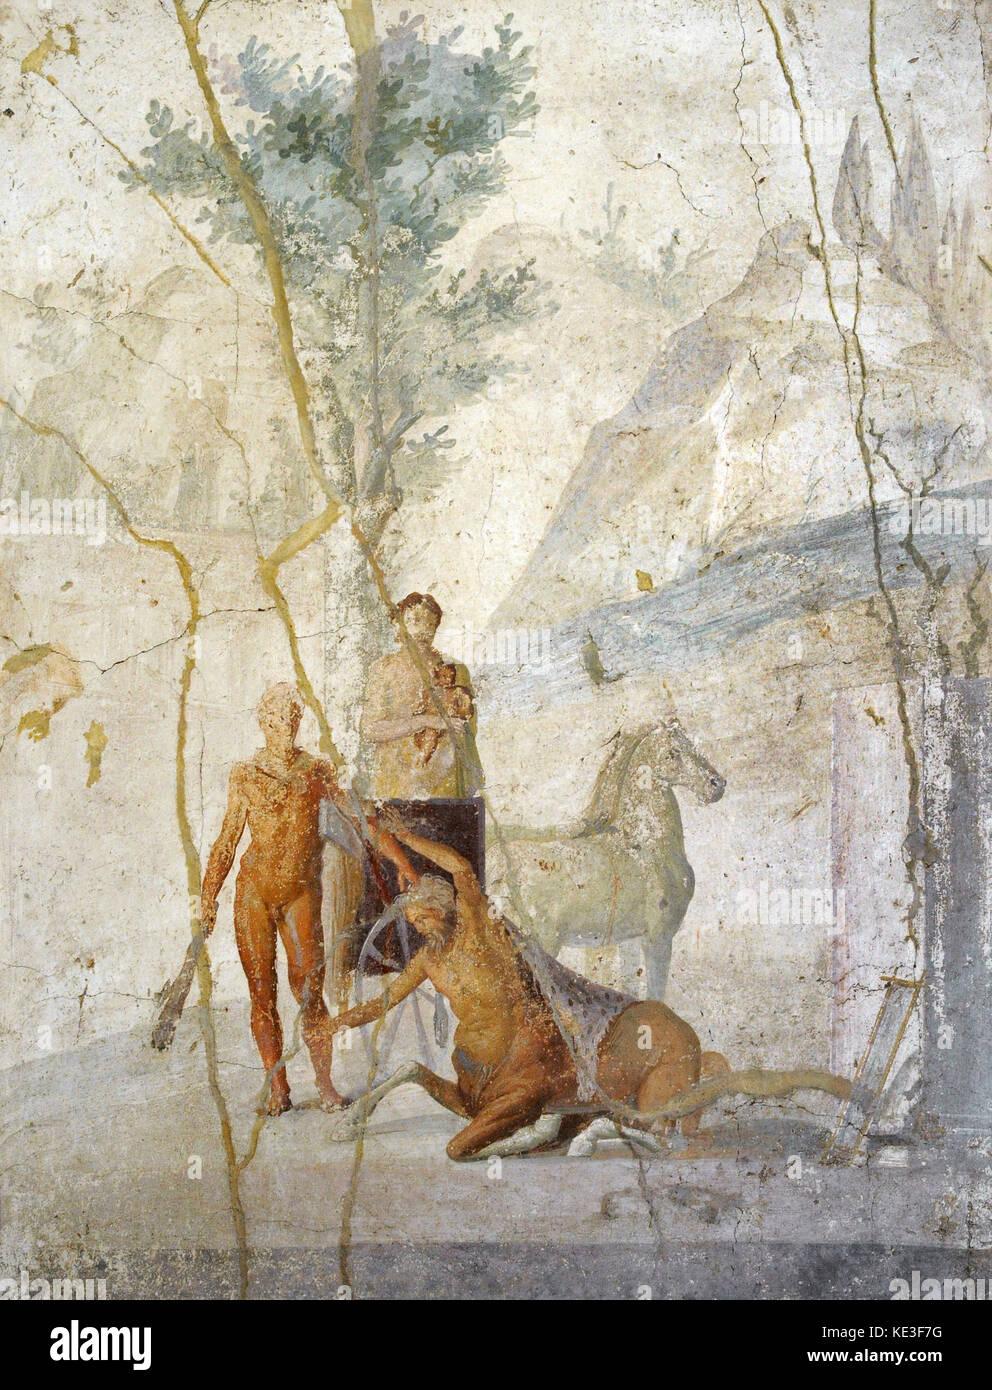 Roman fresco depicting Heracles grabbing the centaur Nessus